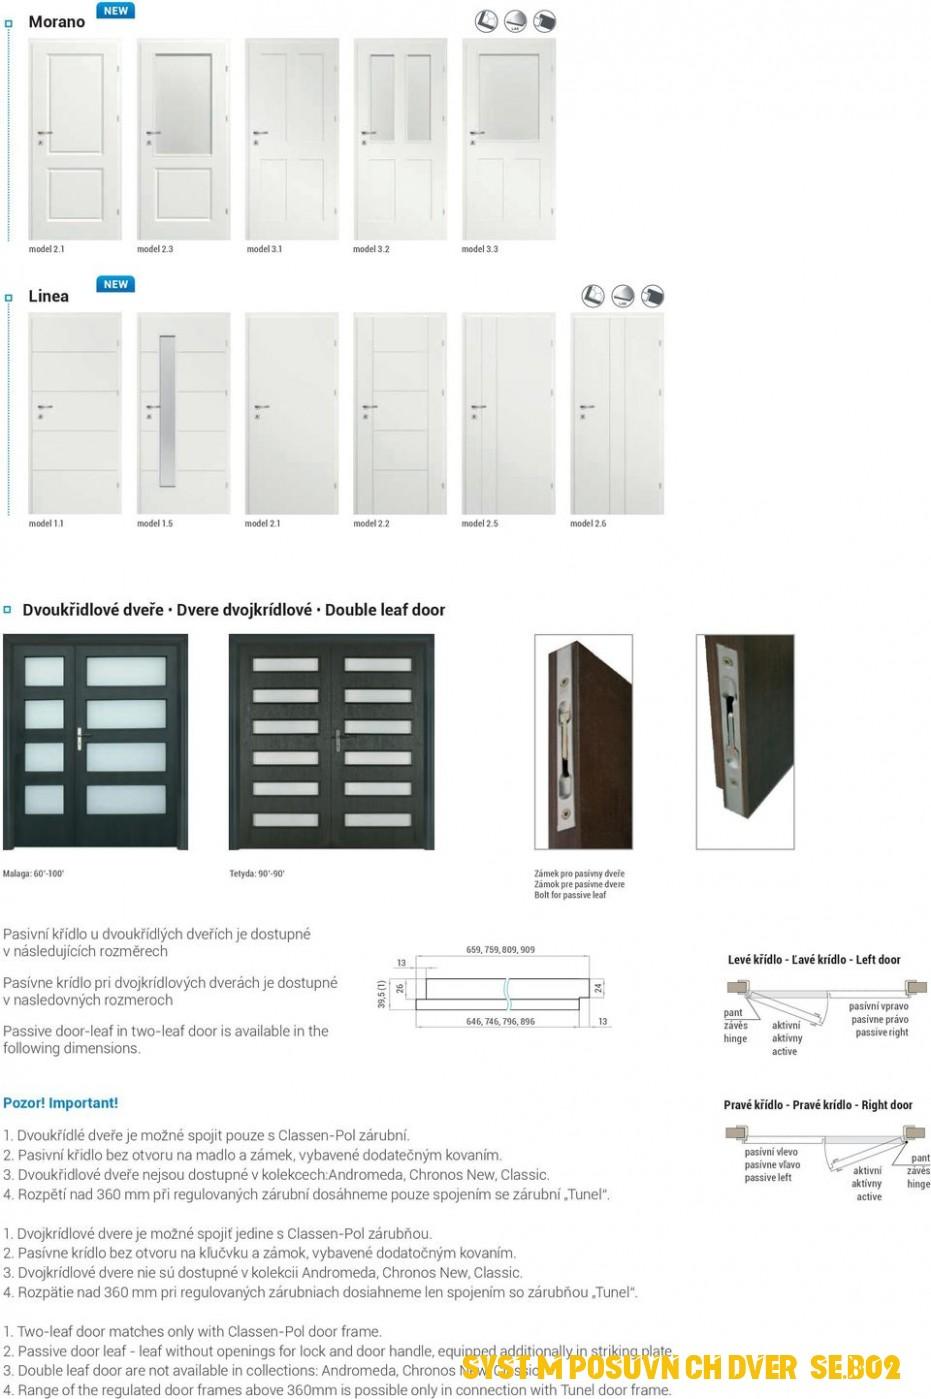 Systém posuvných dverí SE.B02